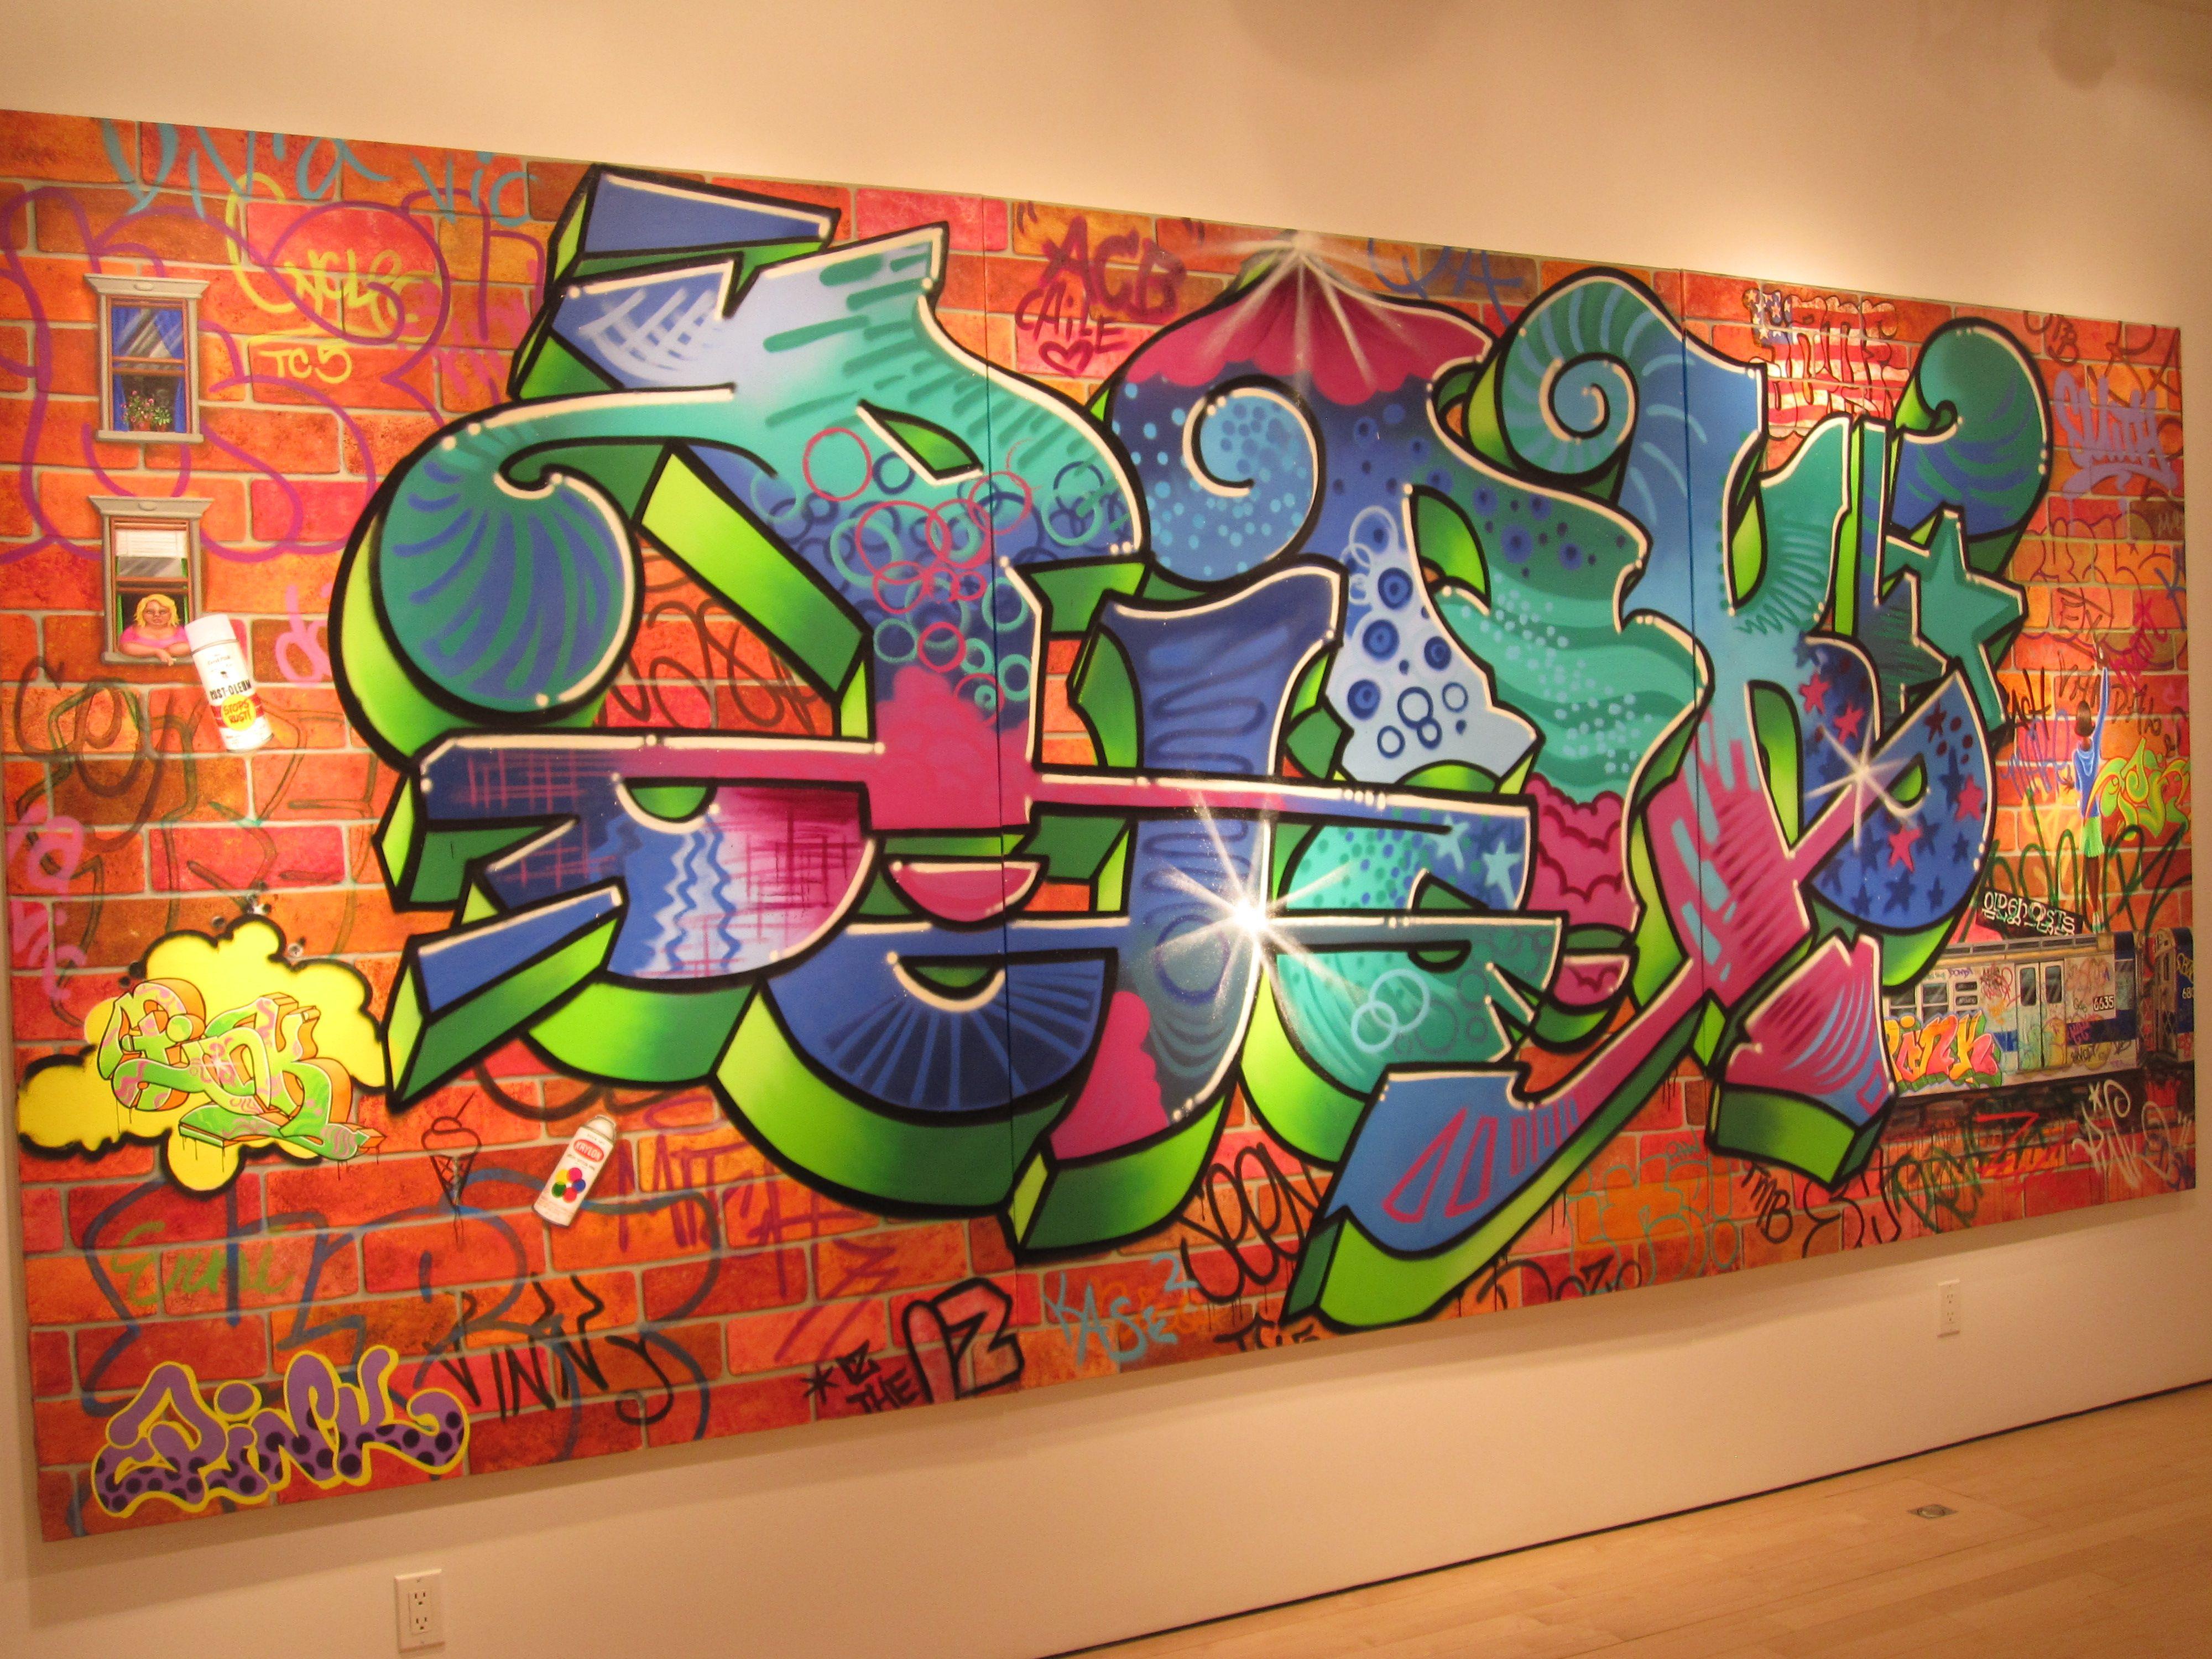 Planet Chocko Art Music Movies Beyond Lady Pink Evolution Graffiti